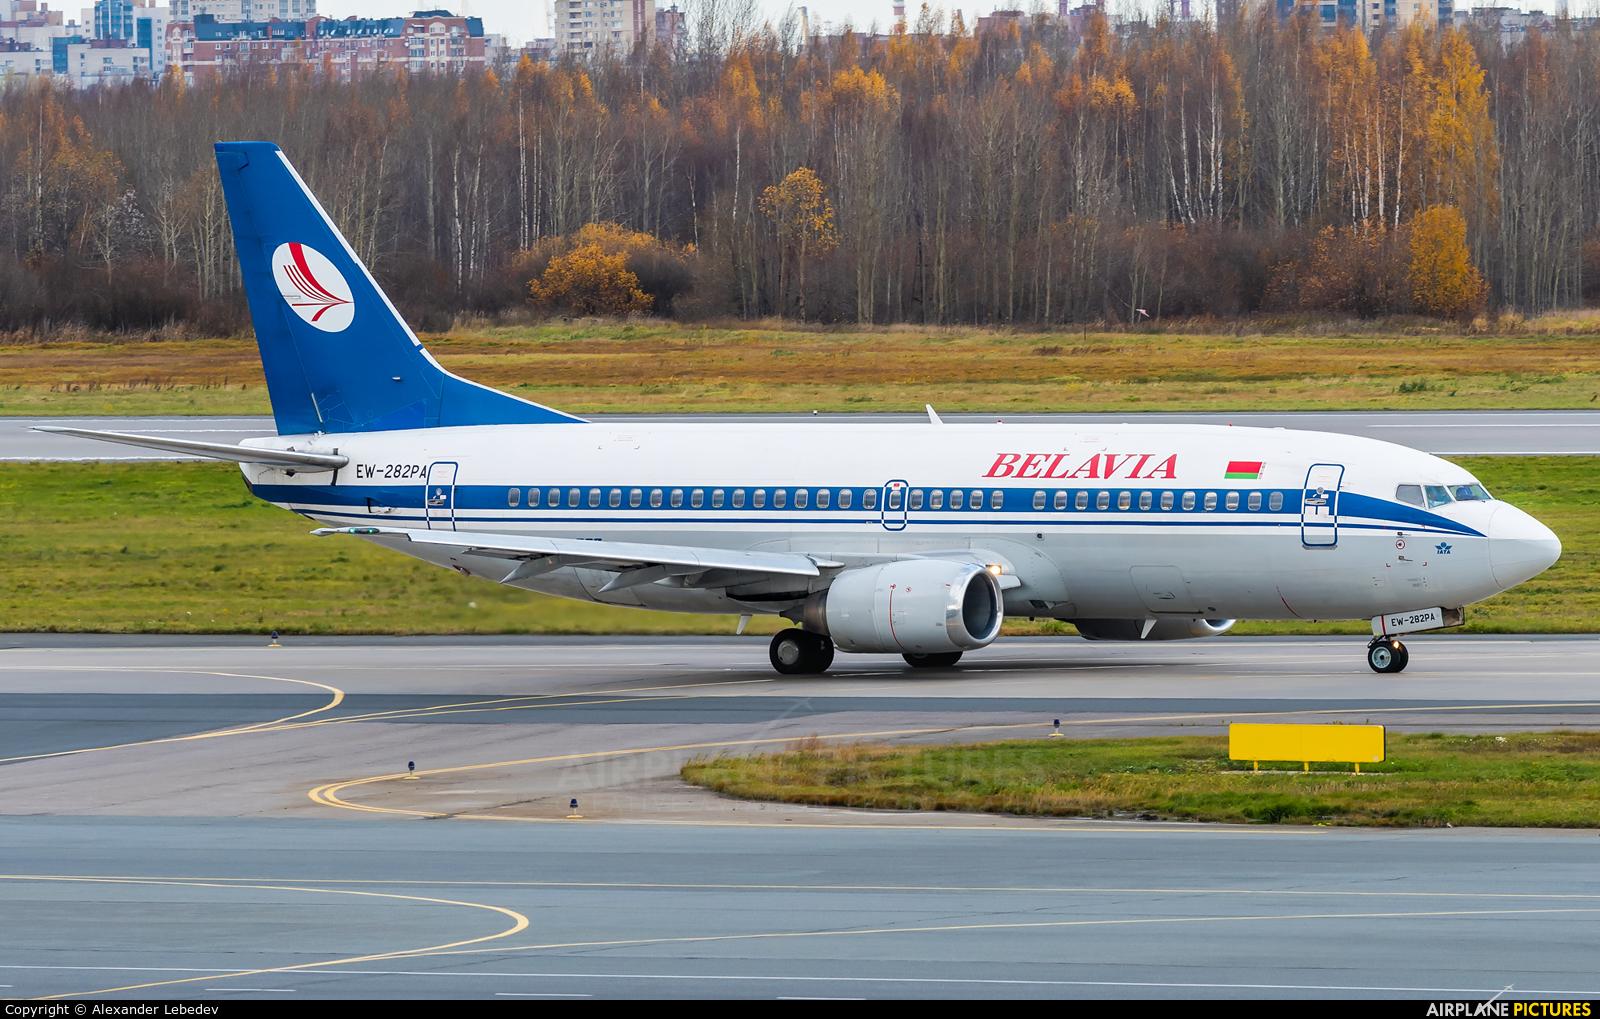 Belavia EW-282PA aircraft at St. Petersburg - Pulkovo